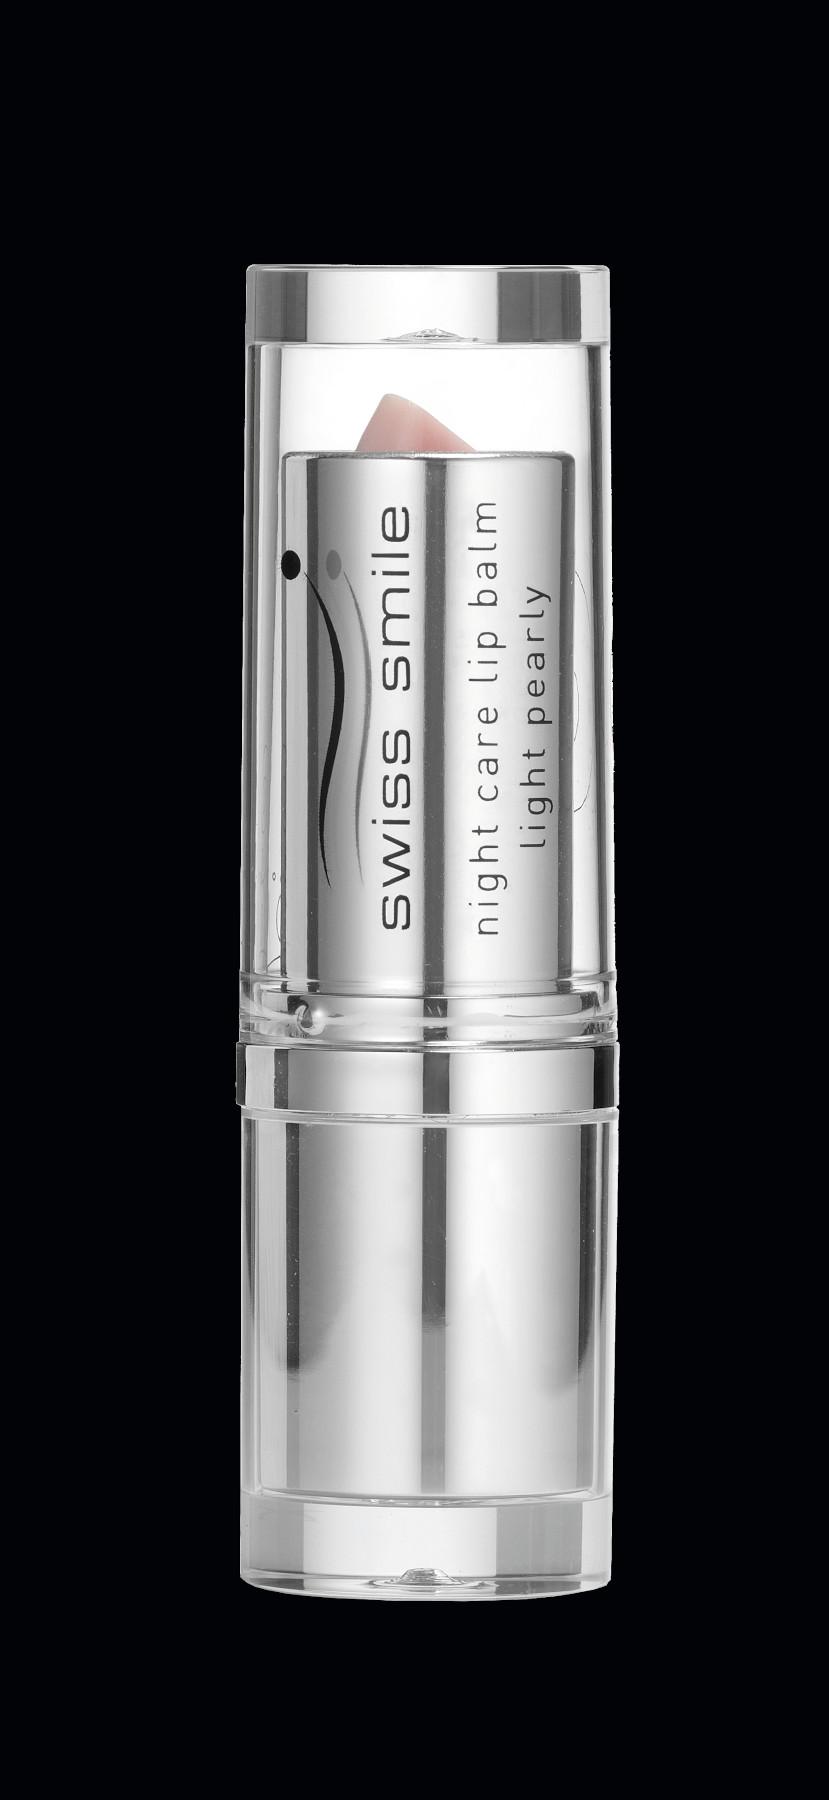 negru 91412971 glorious lips lip balm dispenser closed 1 Glorious lips balsam de buze